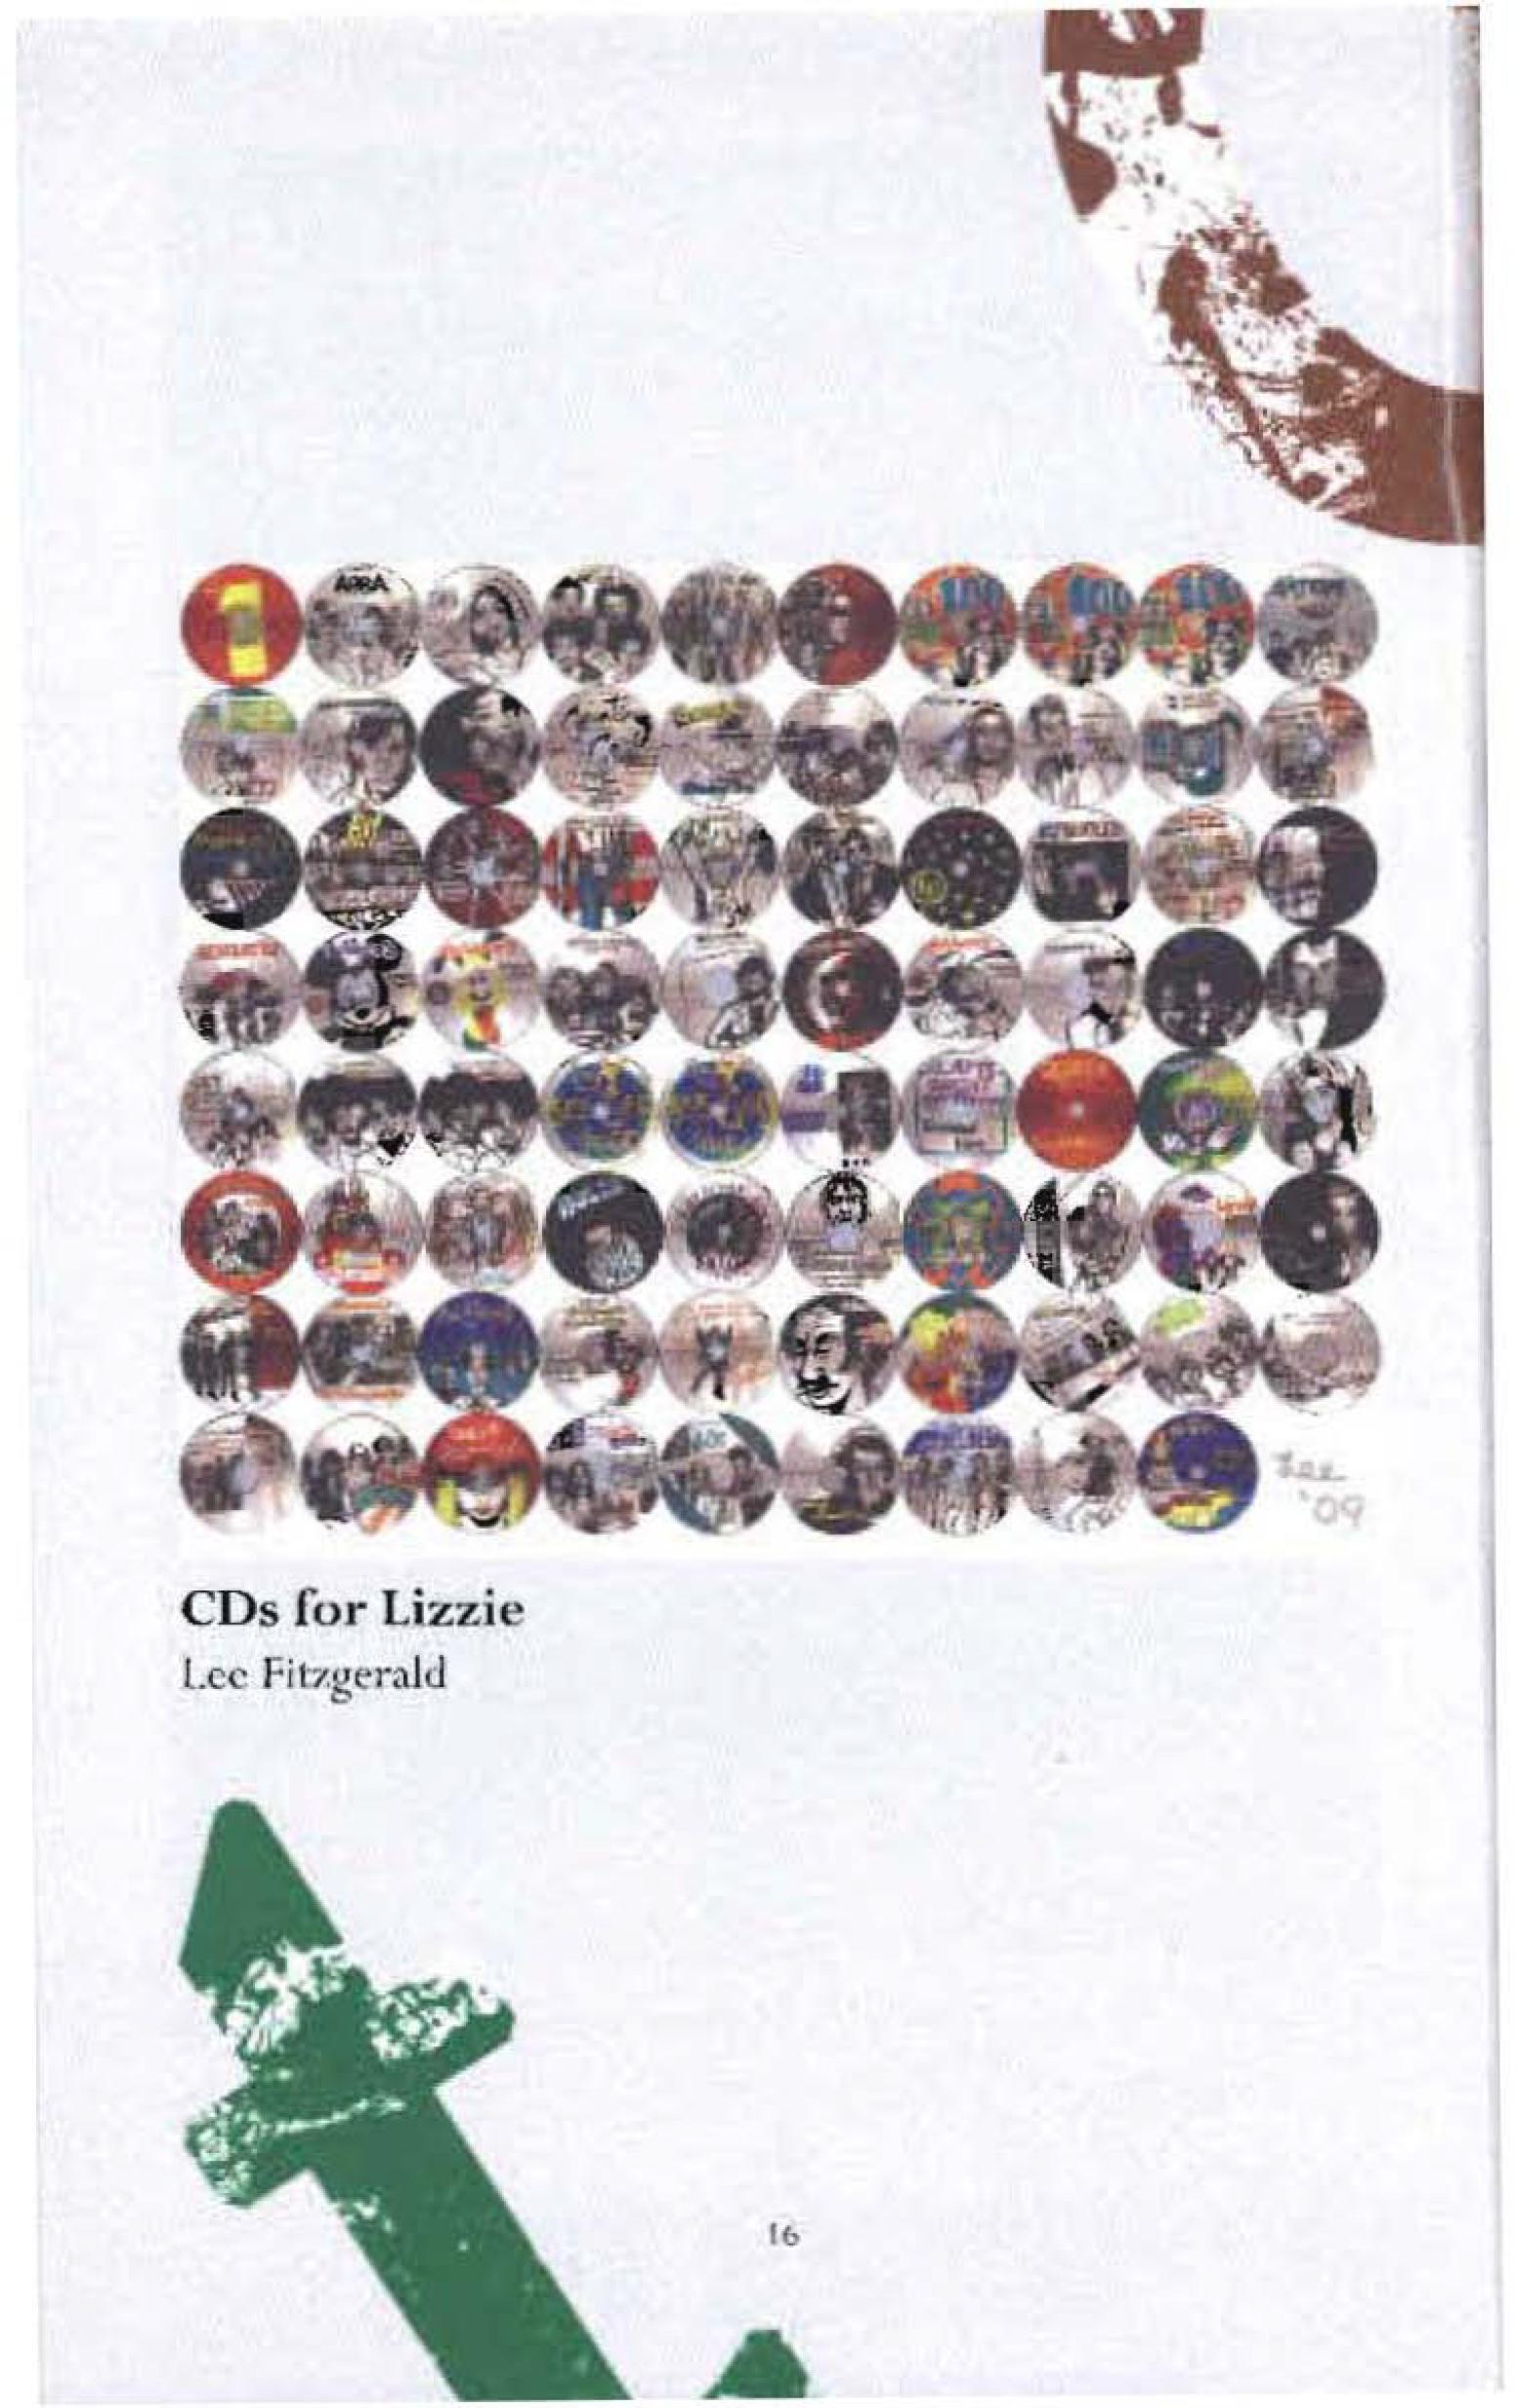 SignaturesBook2010-20.jpg